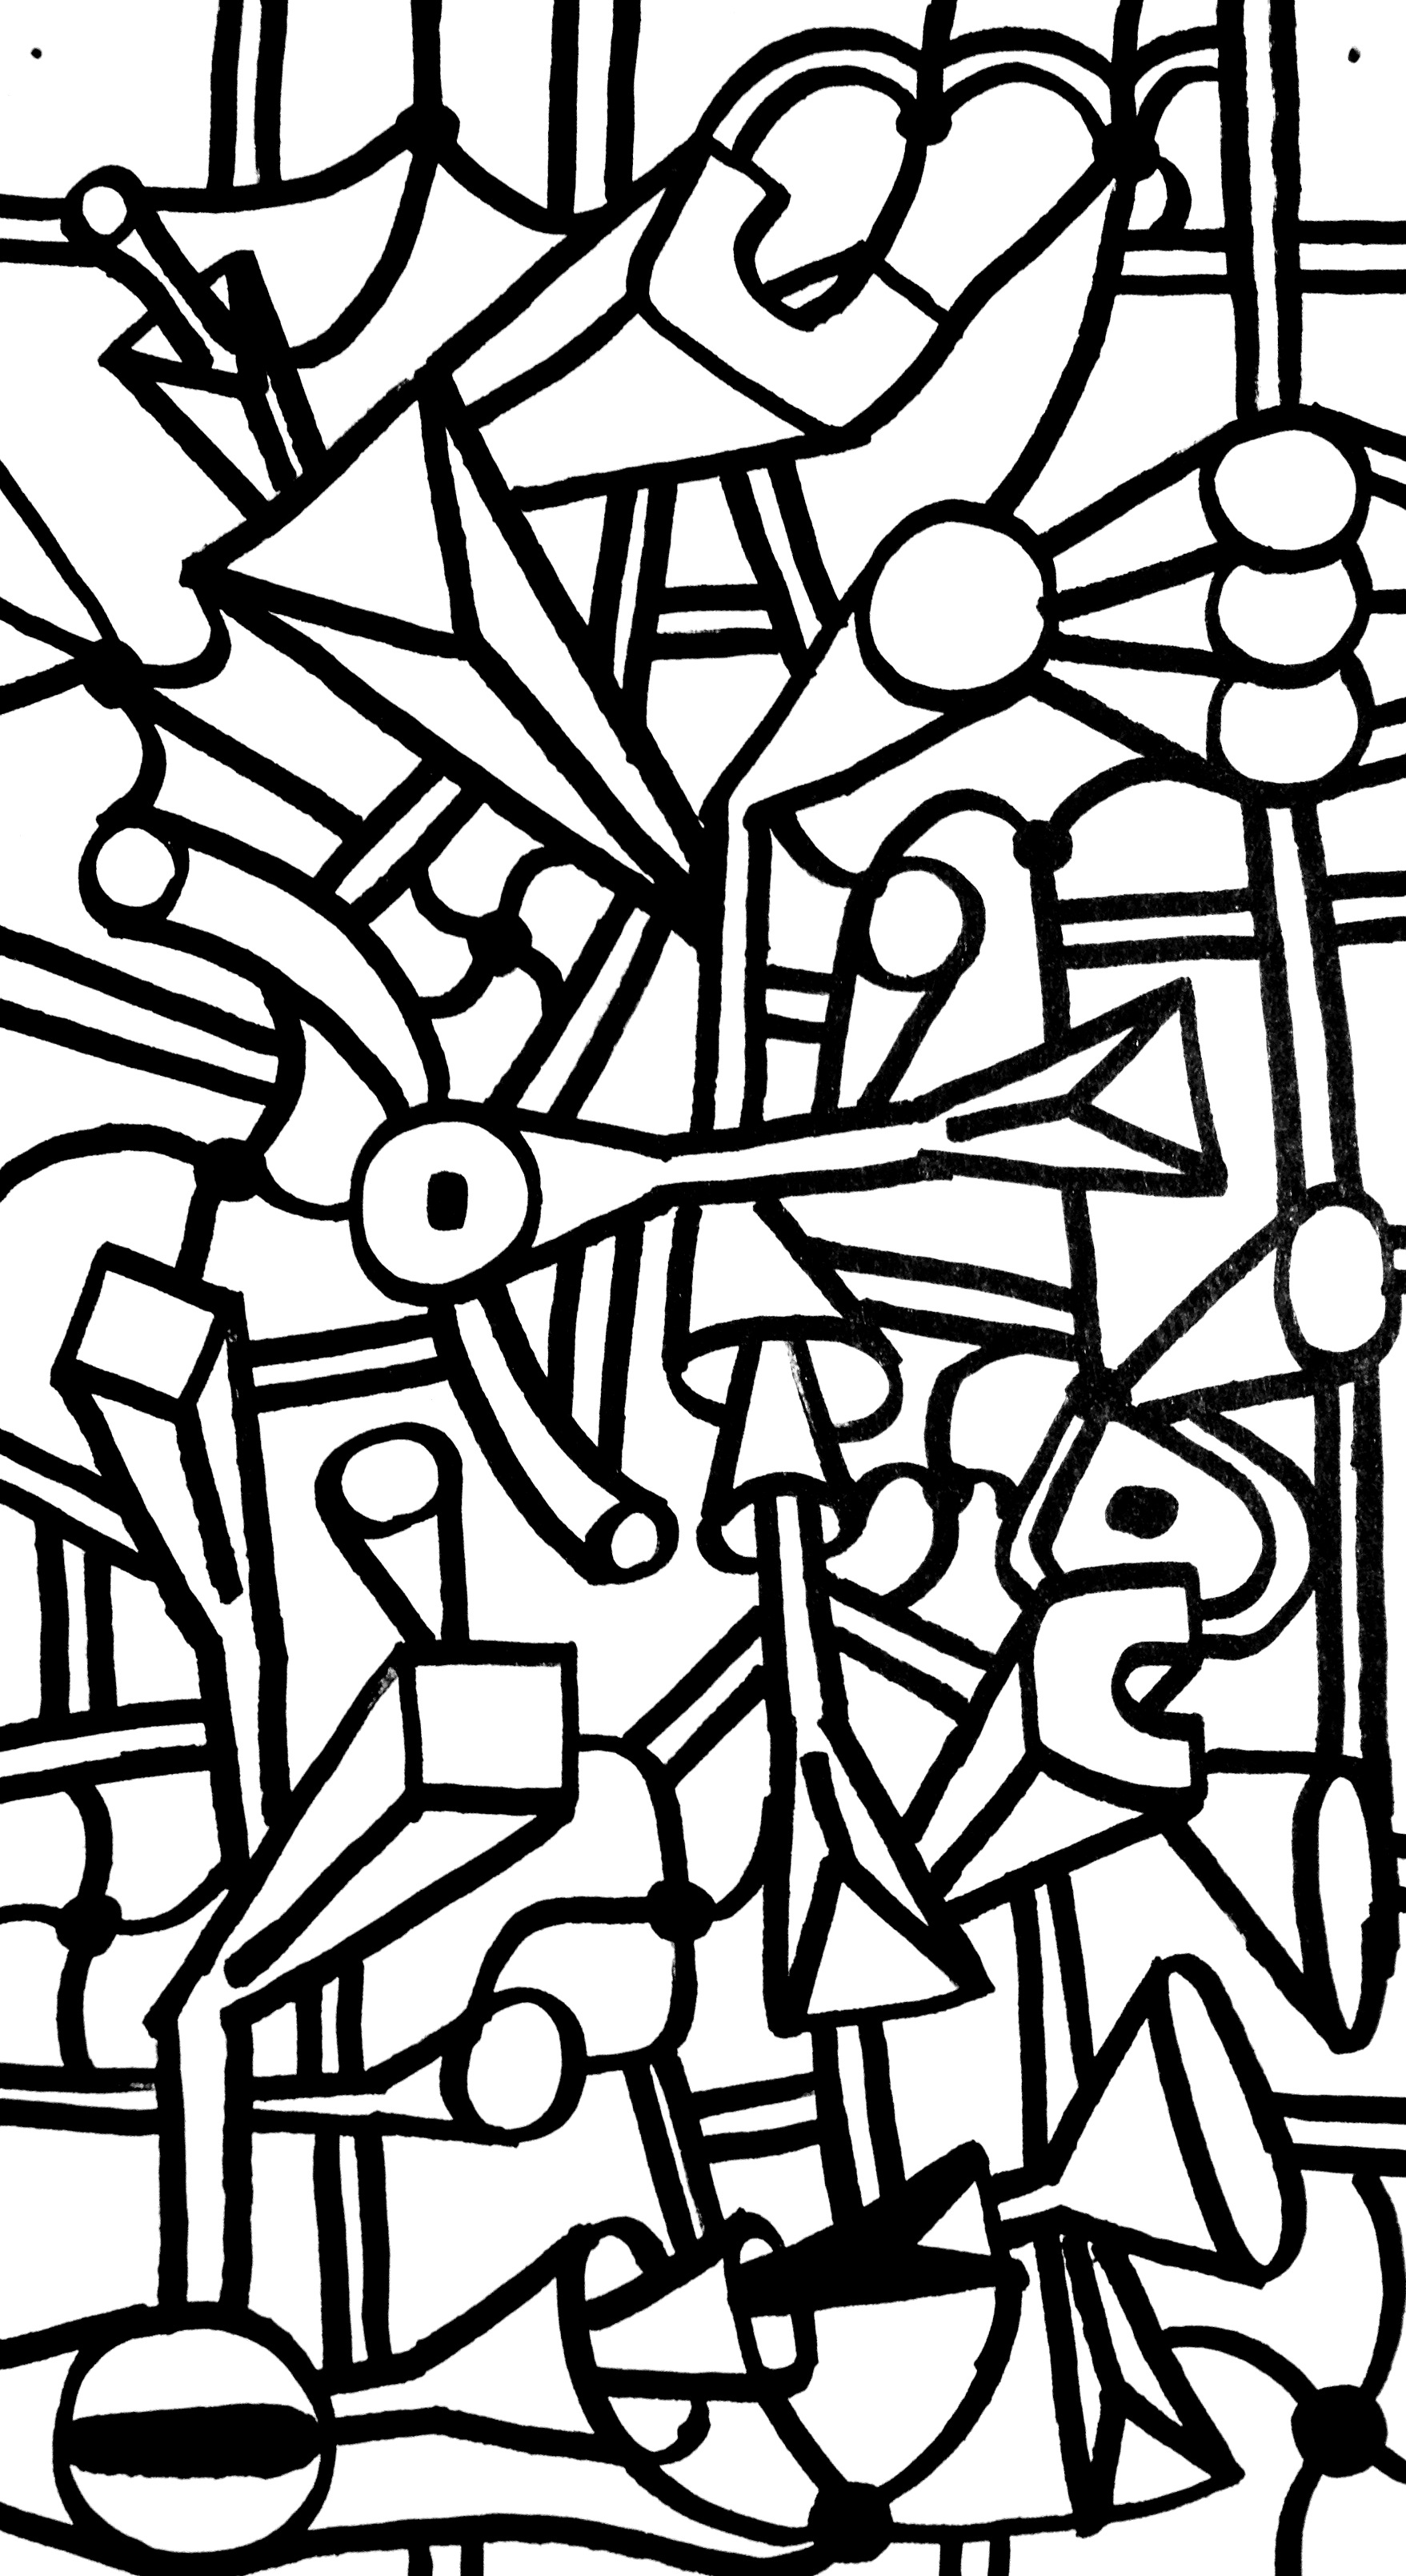 drawing_rabbit.jpeg